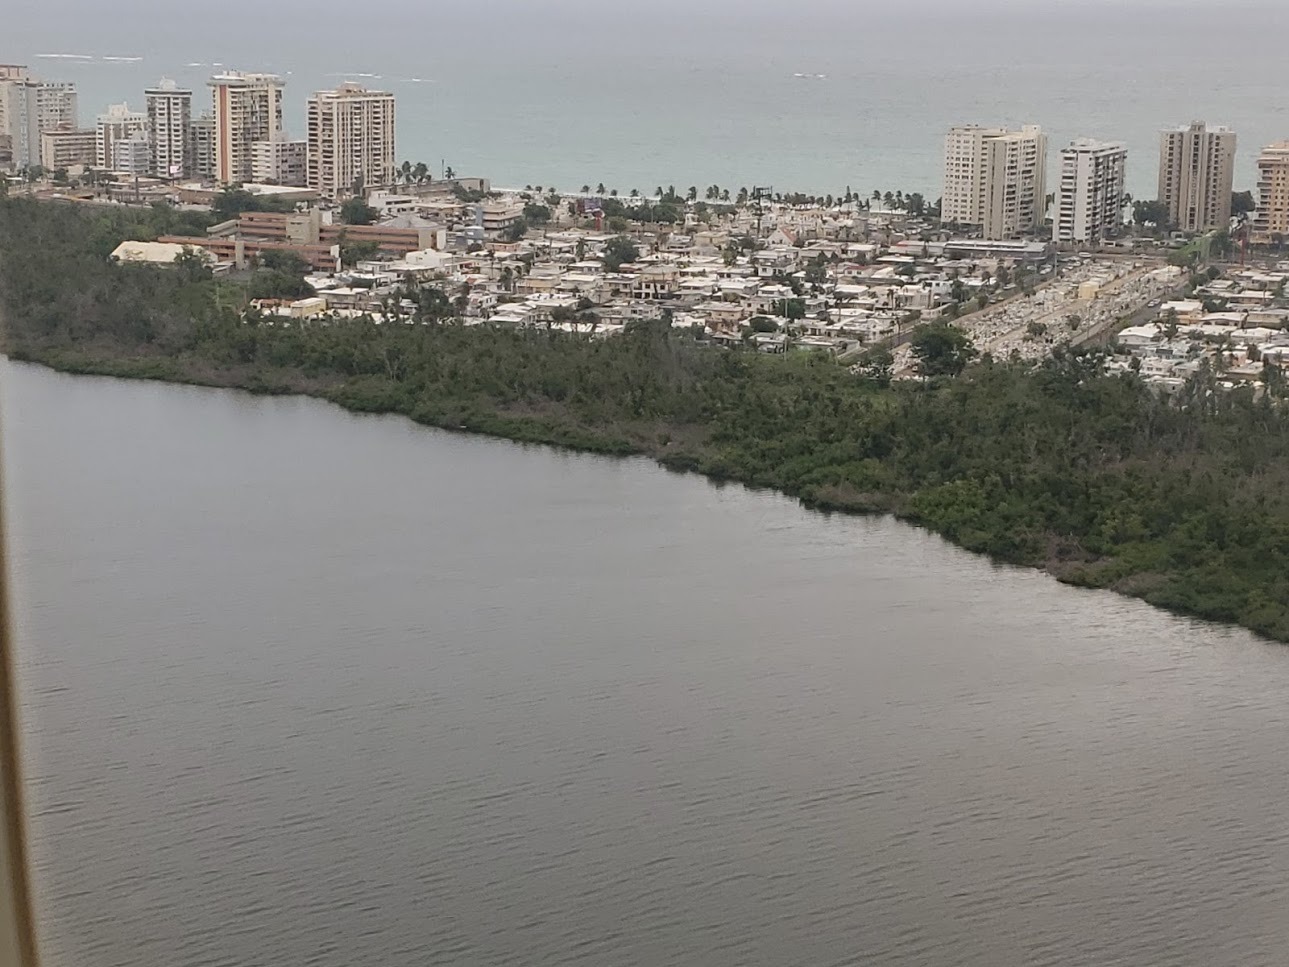 Puerto Rico - August 2018 - Arriving 15